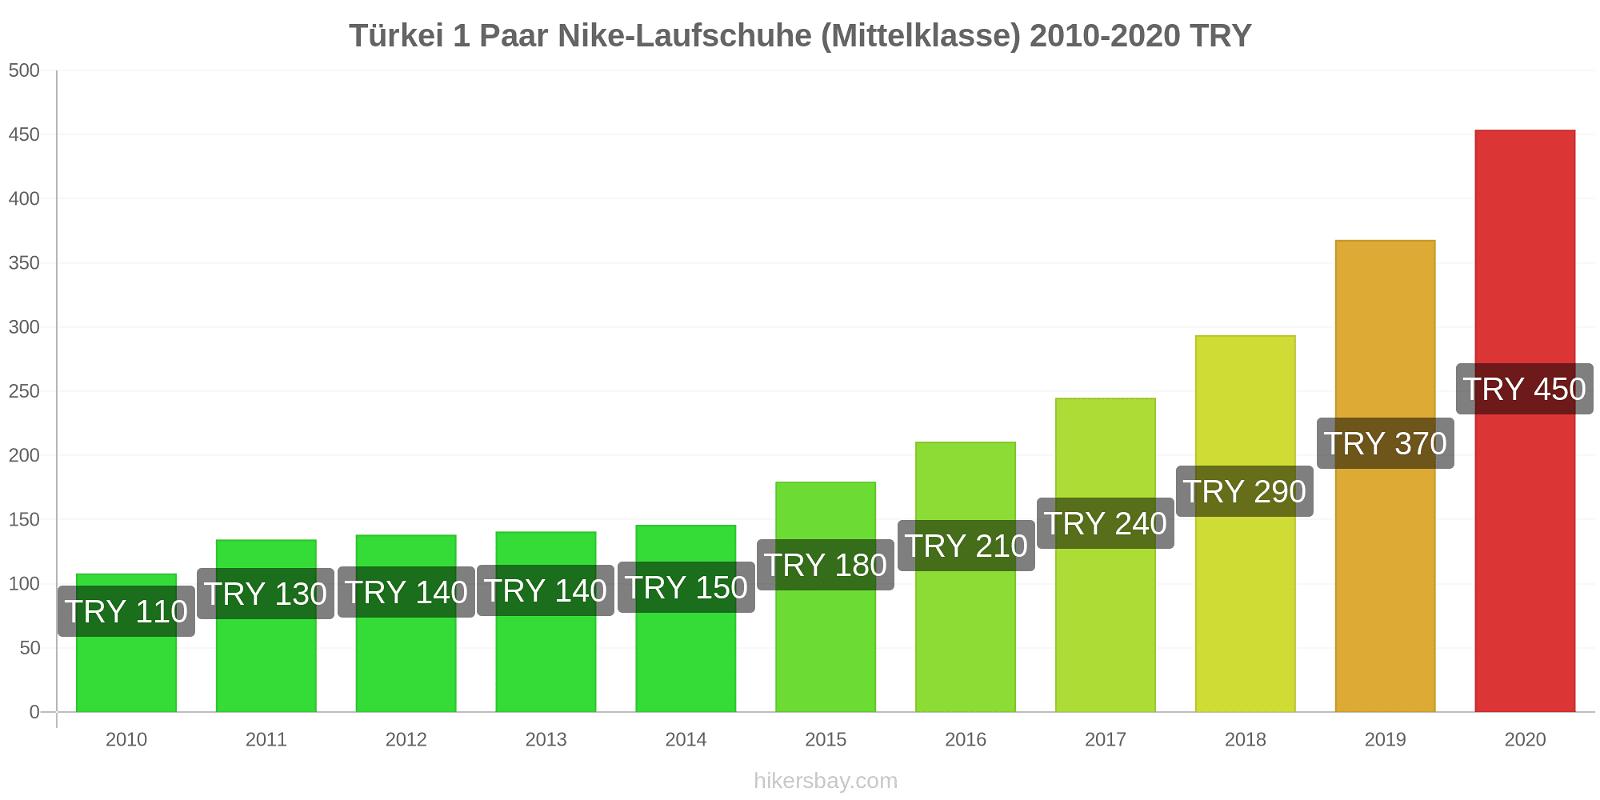 Türkei Preisänderungen 1 Paar Nike Laufschuhe (Mittelklasse) hikersbay.com